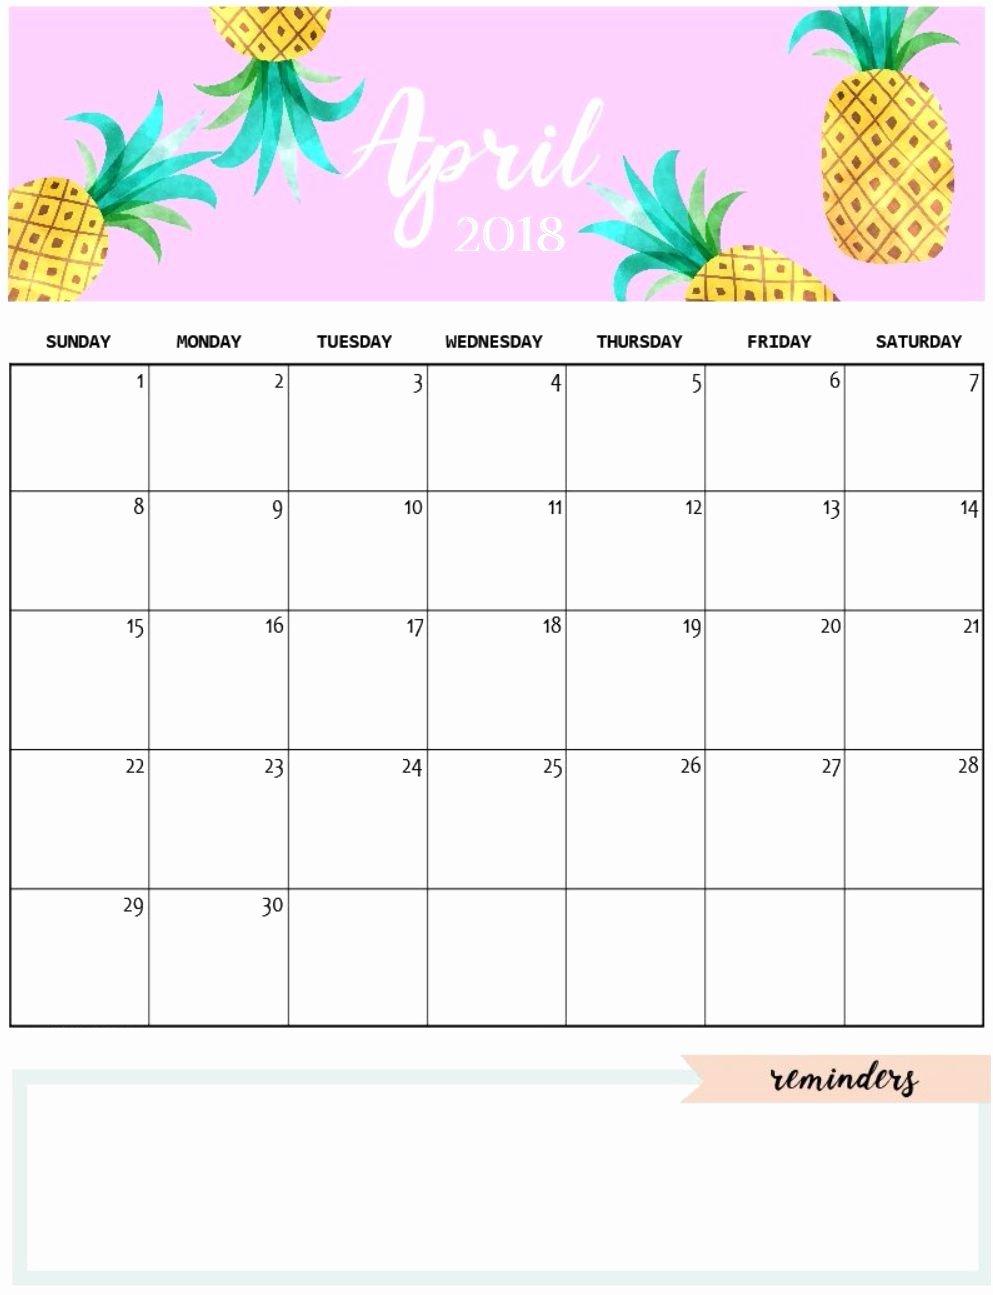 2019 Cute Calendar Printable Lovely Cute April 2018 Calendar Template Calendars